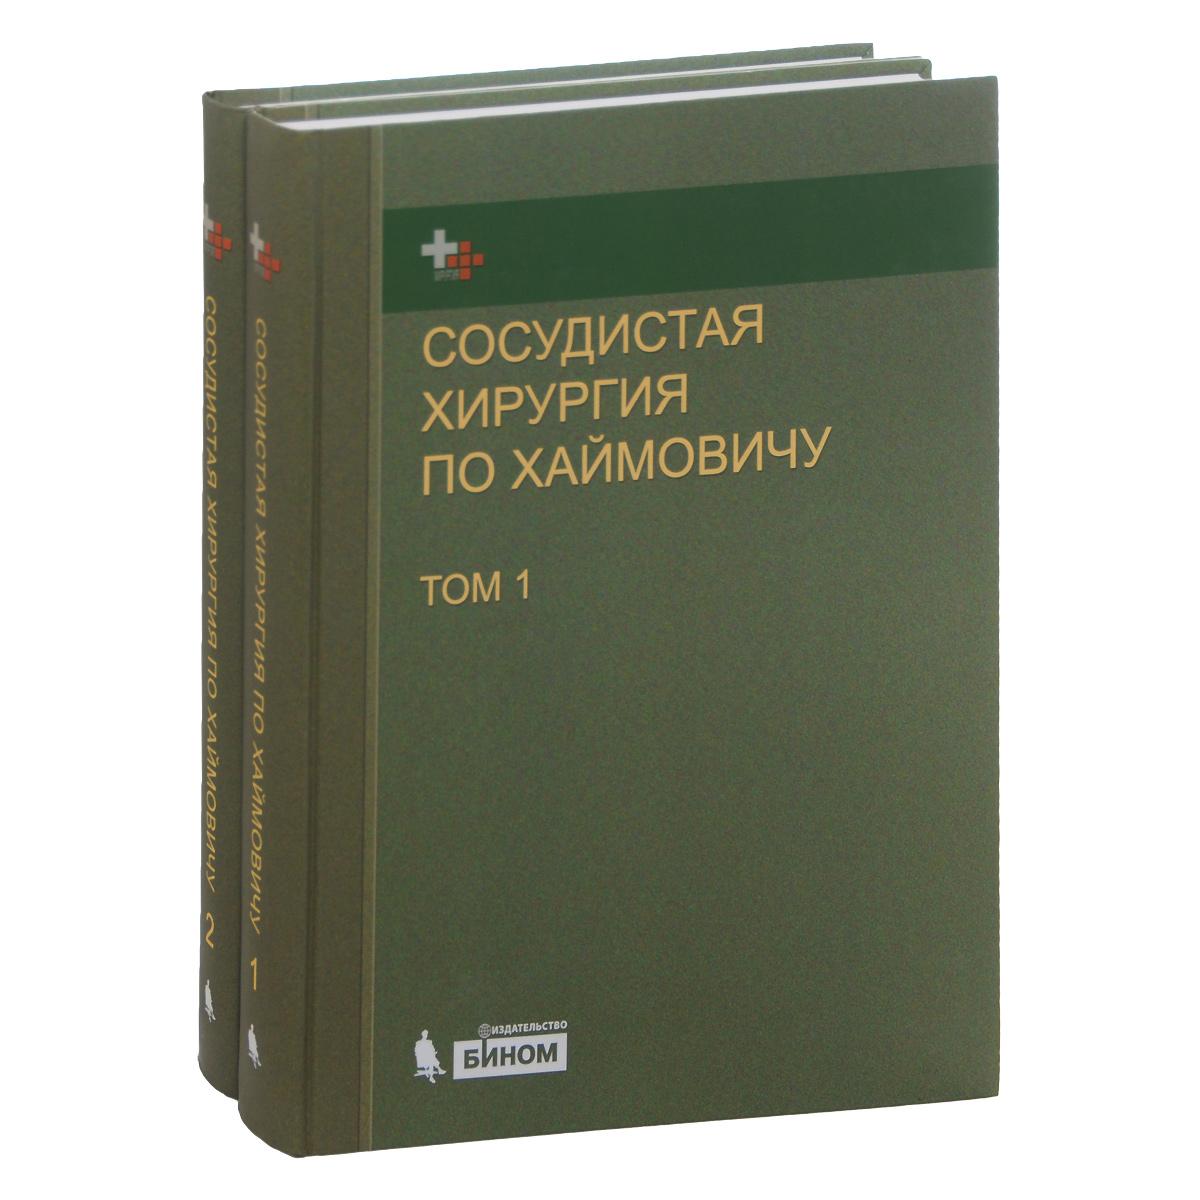 Сосудистая хирургия по Хаймовичу. В 2 томах (комплект)